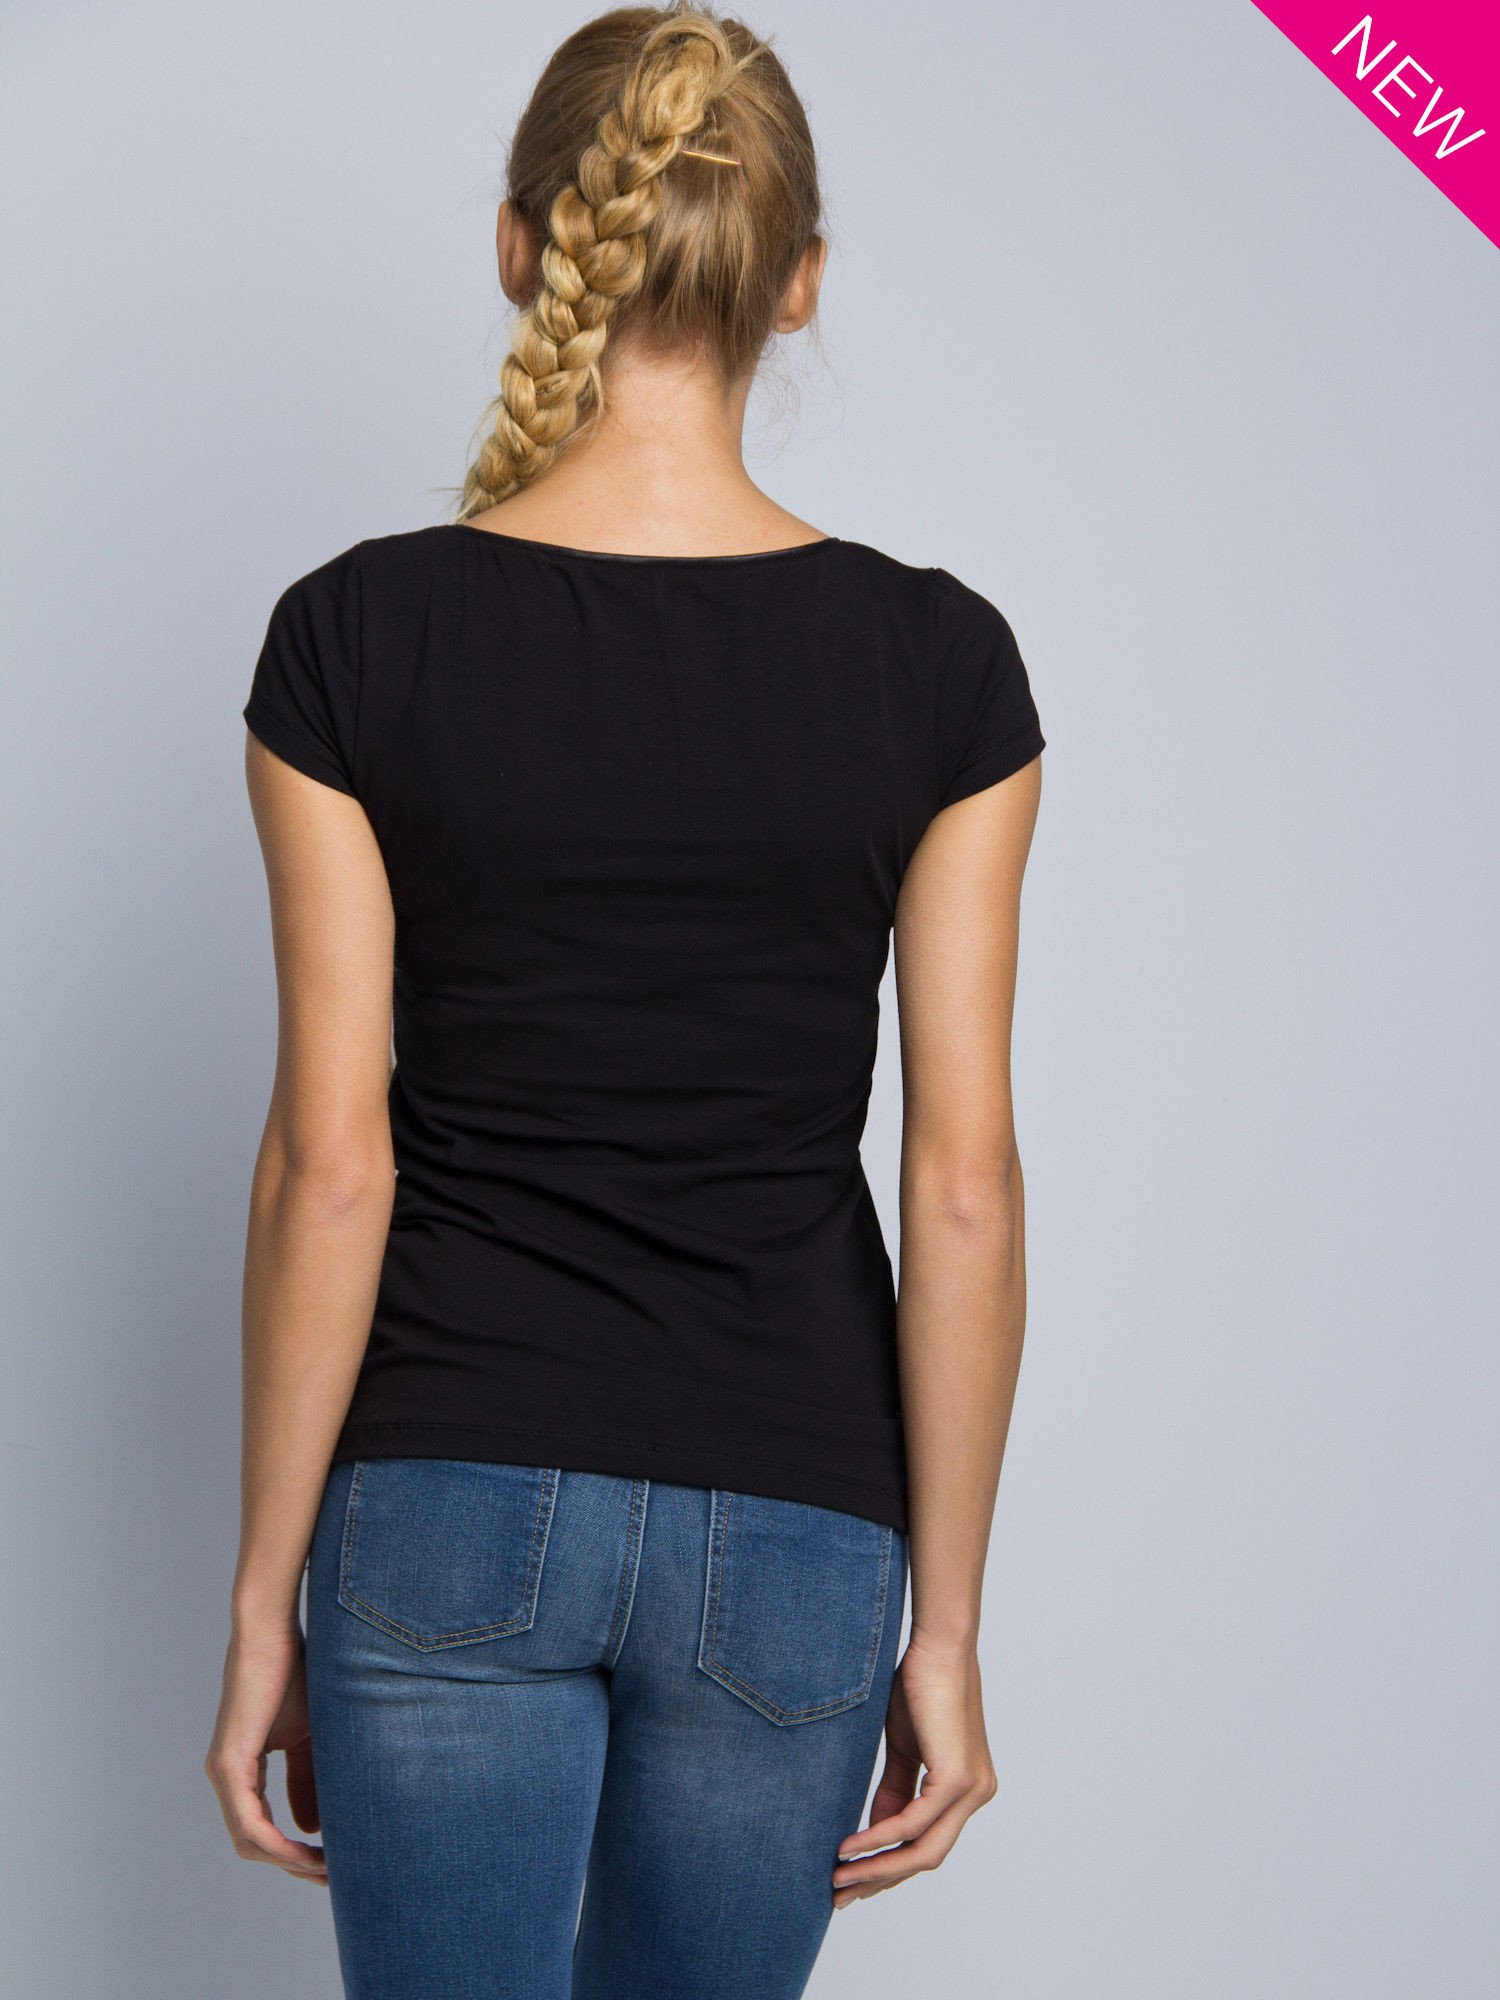 Czarny t-shirt z czarną lamówką przy dekolcie                                  zdj.                                  3